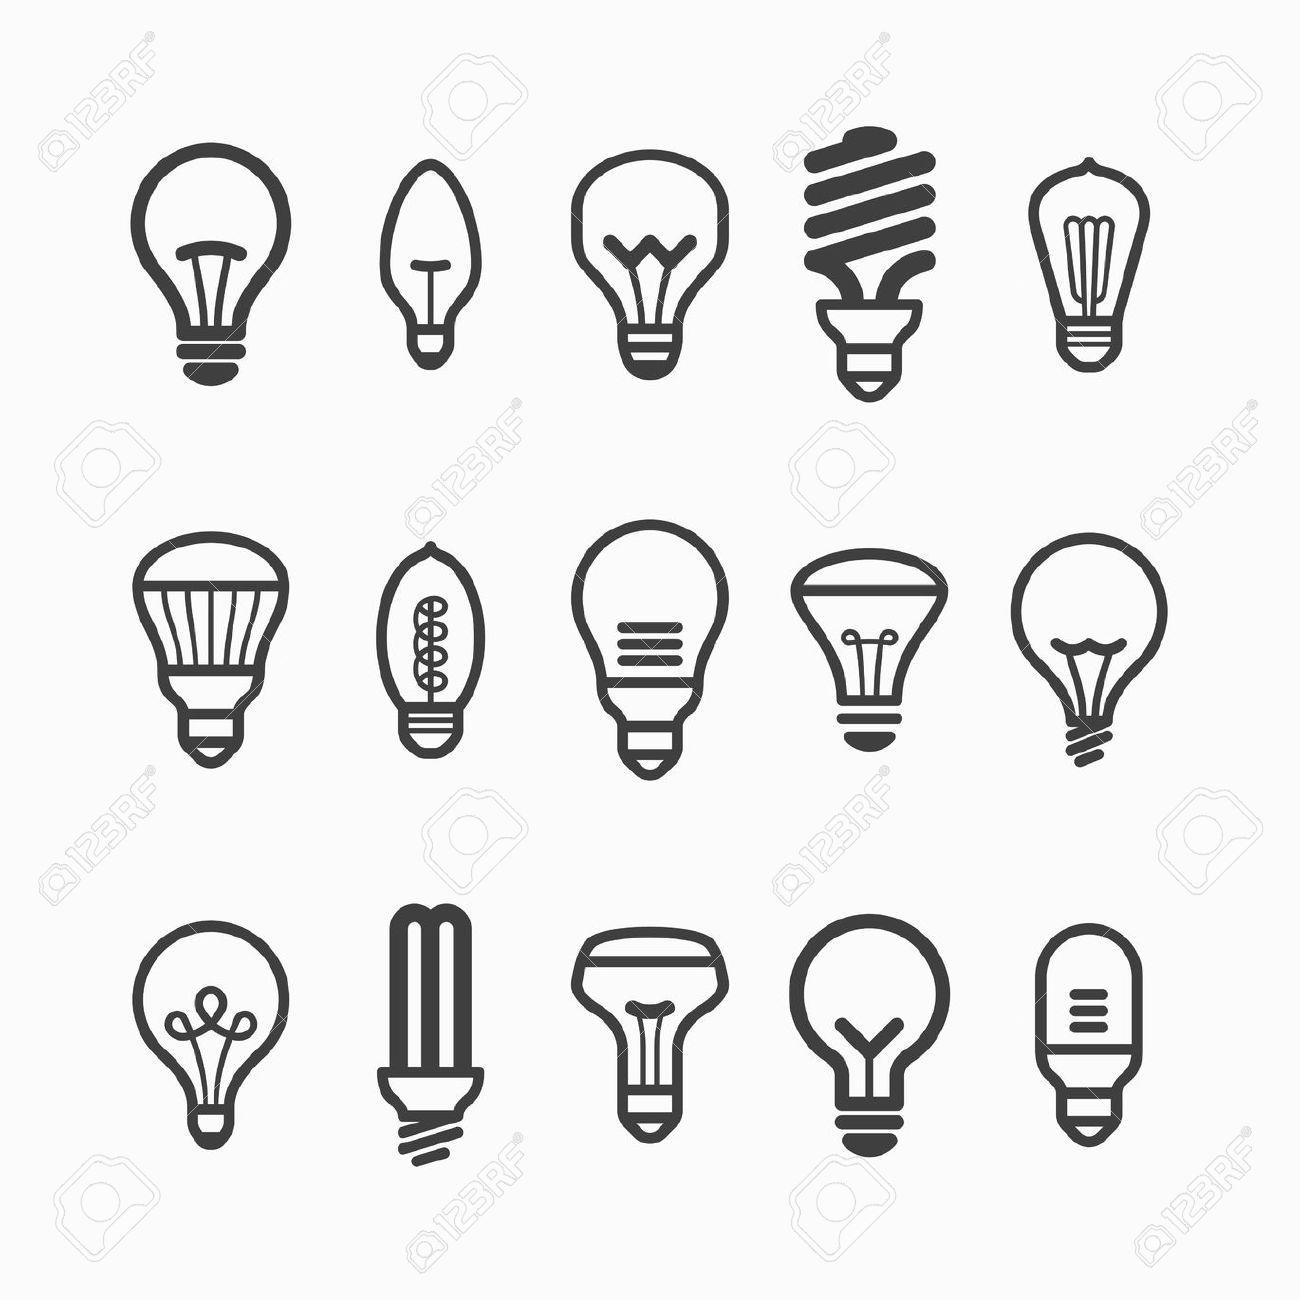 Electrical Symbol For Light Bulb